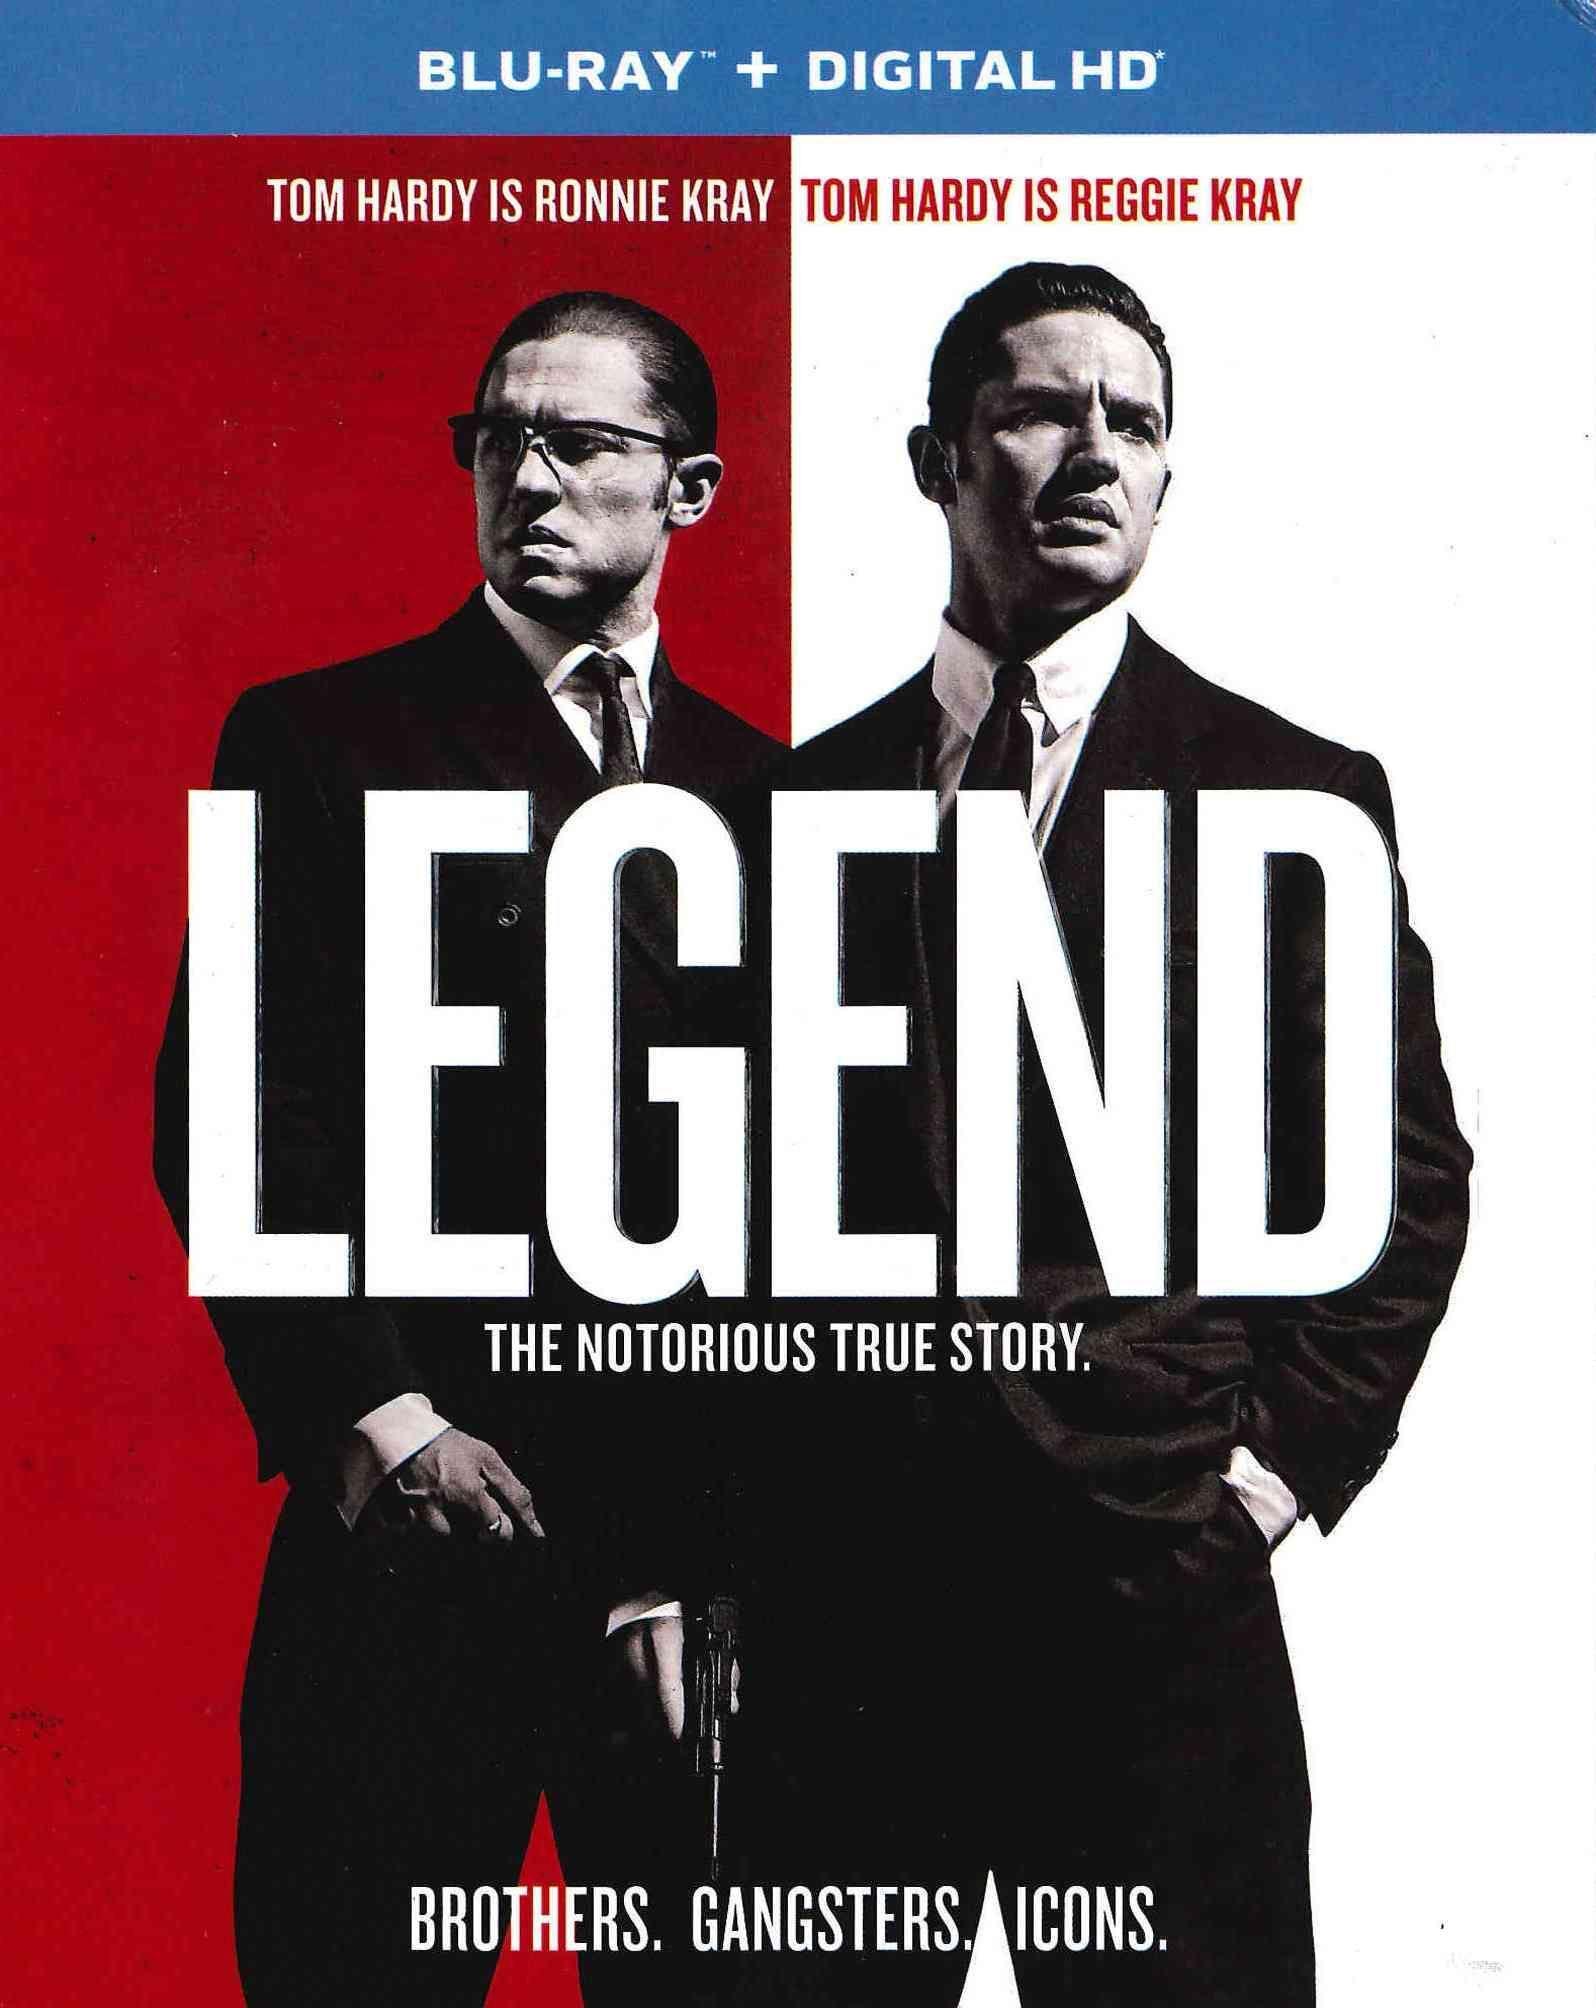 Legend Blu Ray Disc Overstock Com Shopping The Best Deals On Mystery Suspense Tom Hardy Legend 2015 Legend